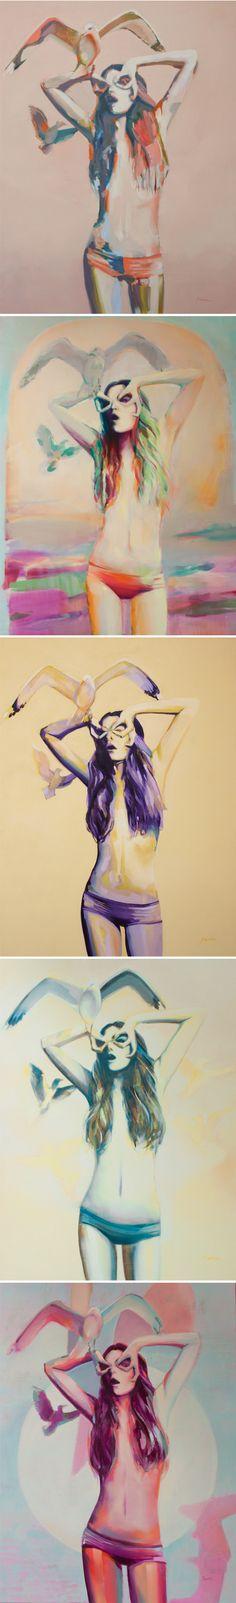 paintings by zoe pawlak <3